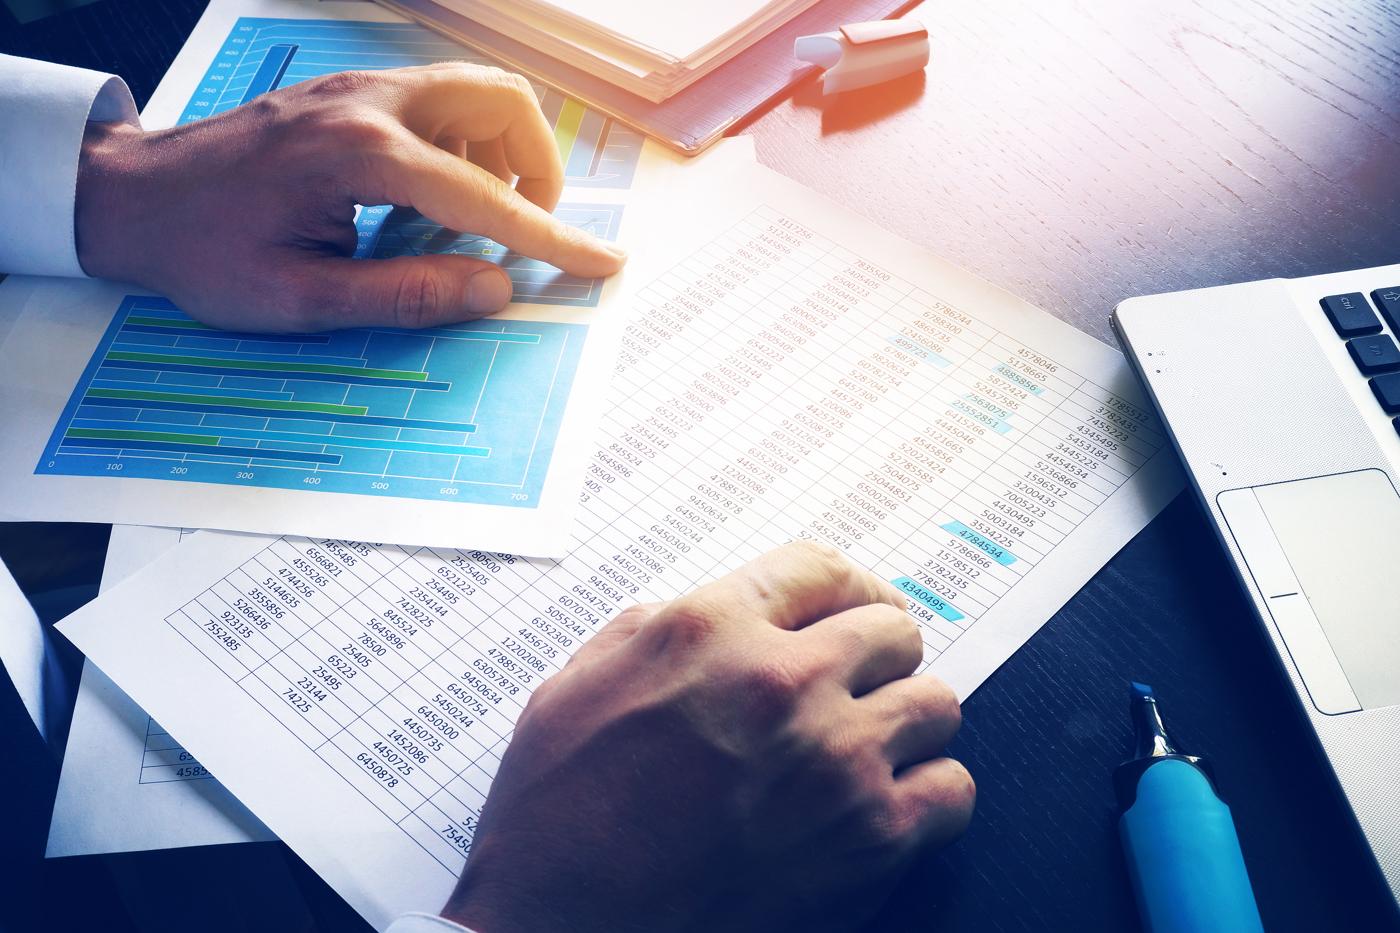 Earnings expectations, Earnings report, Earnings outlook, Revenue forecast